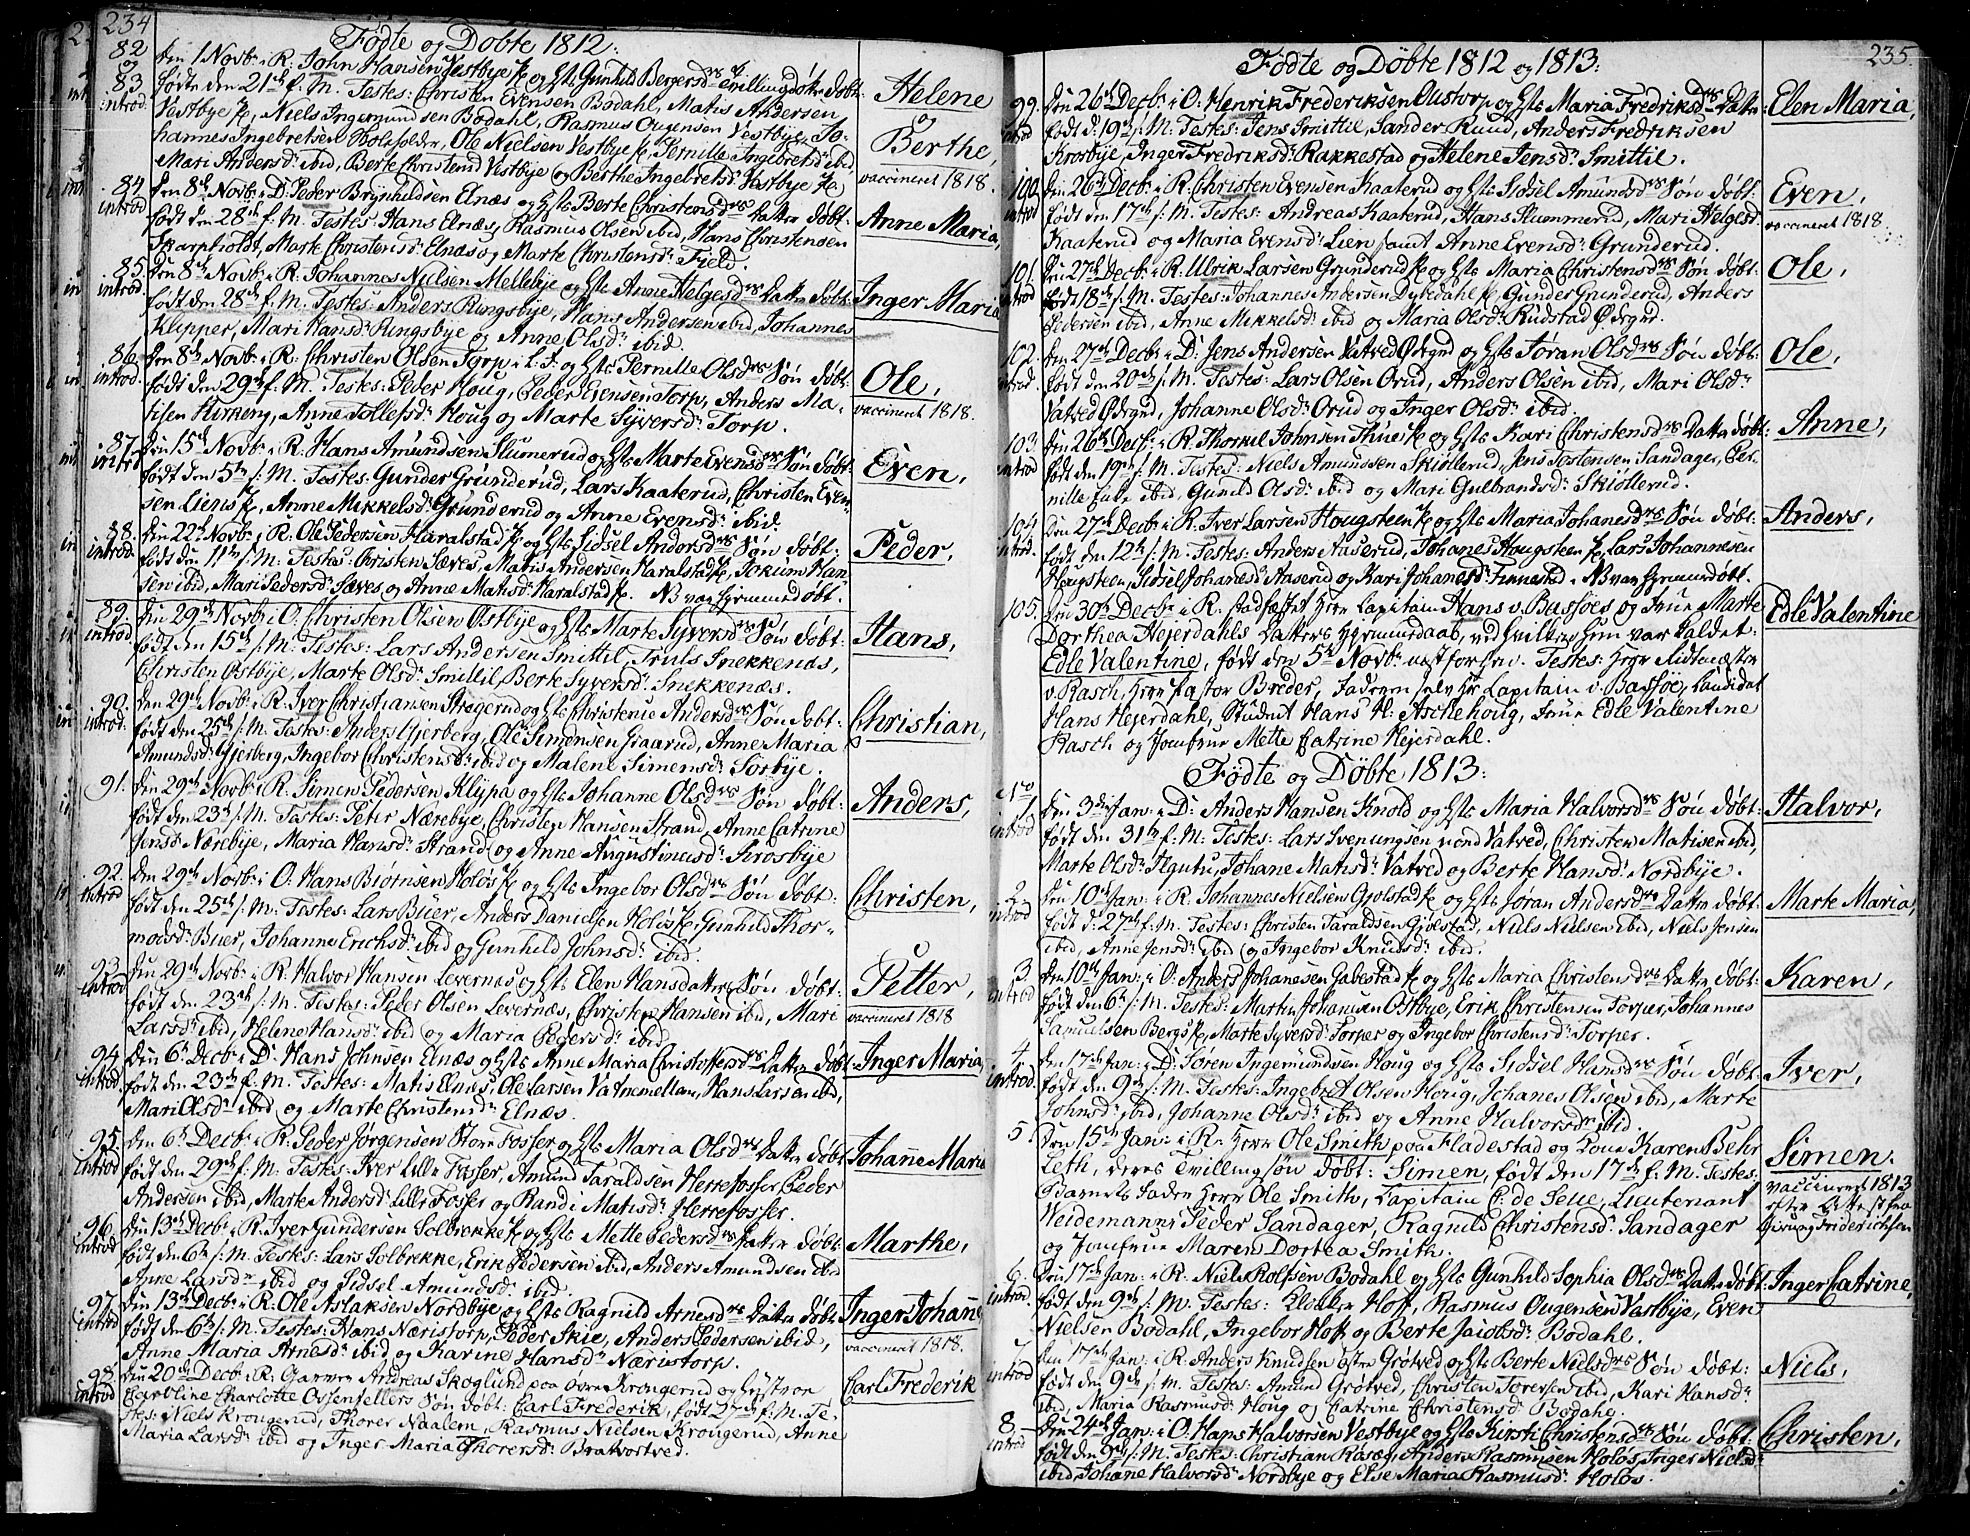 SAO, Rakkestad prestekontor Kirkebøker, F/Fa/L0005: Ministerialbok nr. I 5, 1784-1814, s. 234-235